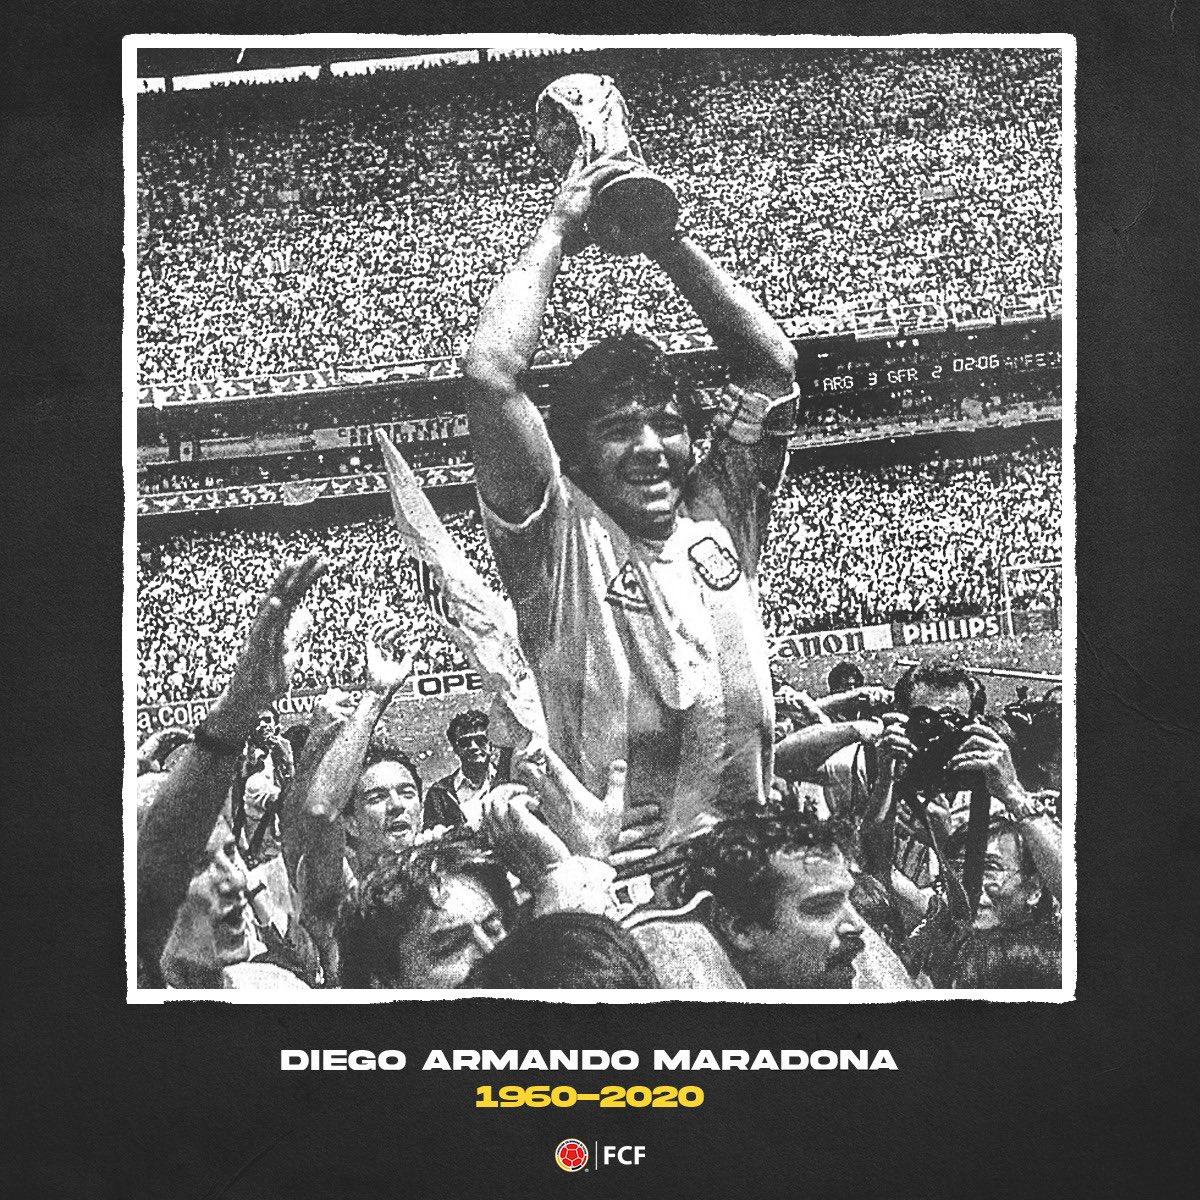 FCF lamenta profundamente el fallecimiento de Diego Armando Maradona. Q.E.P.D.